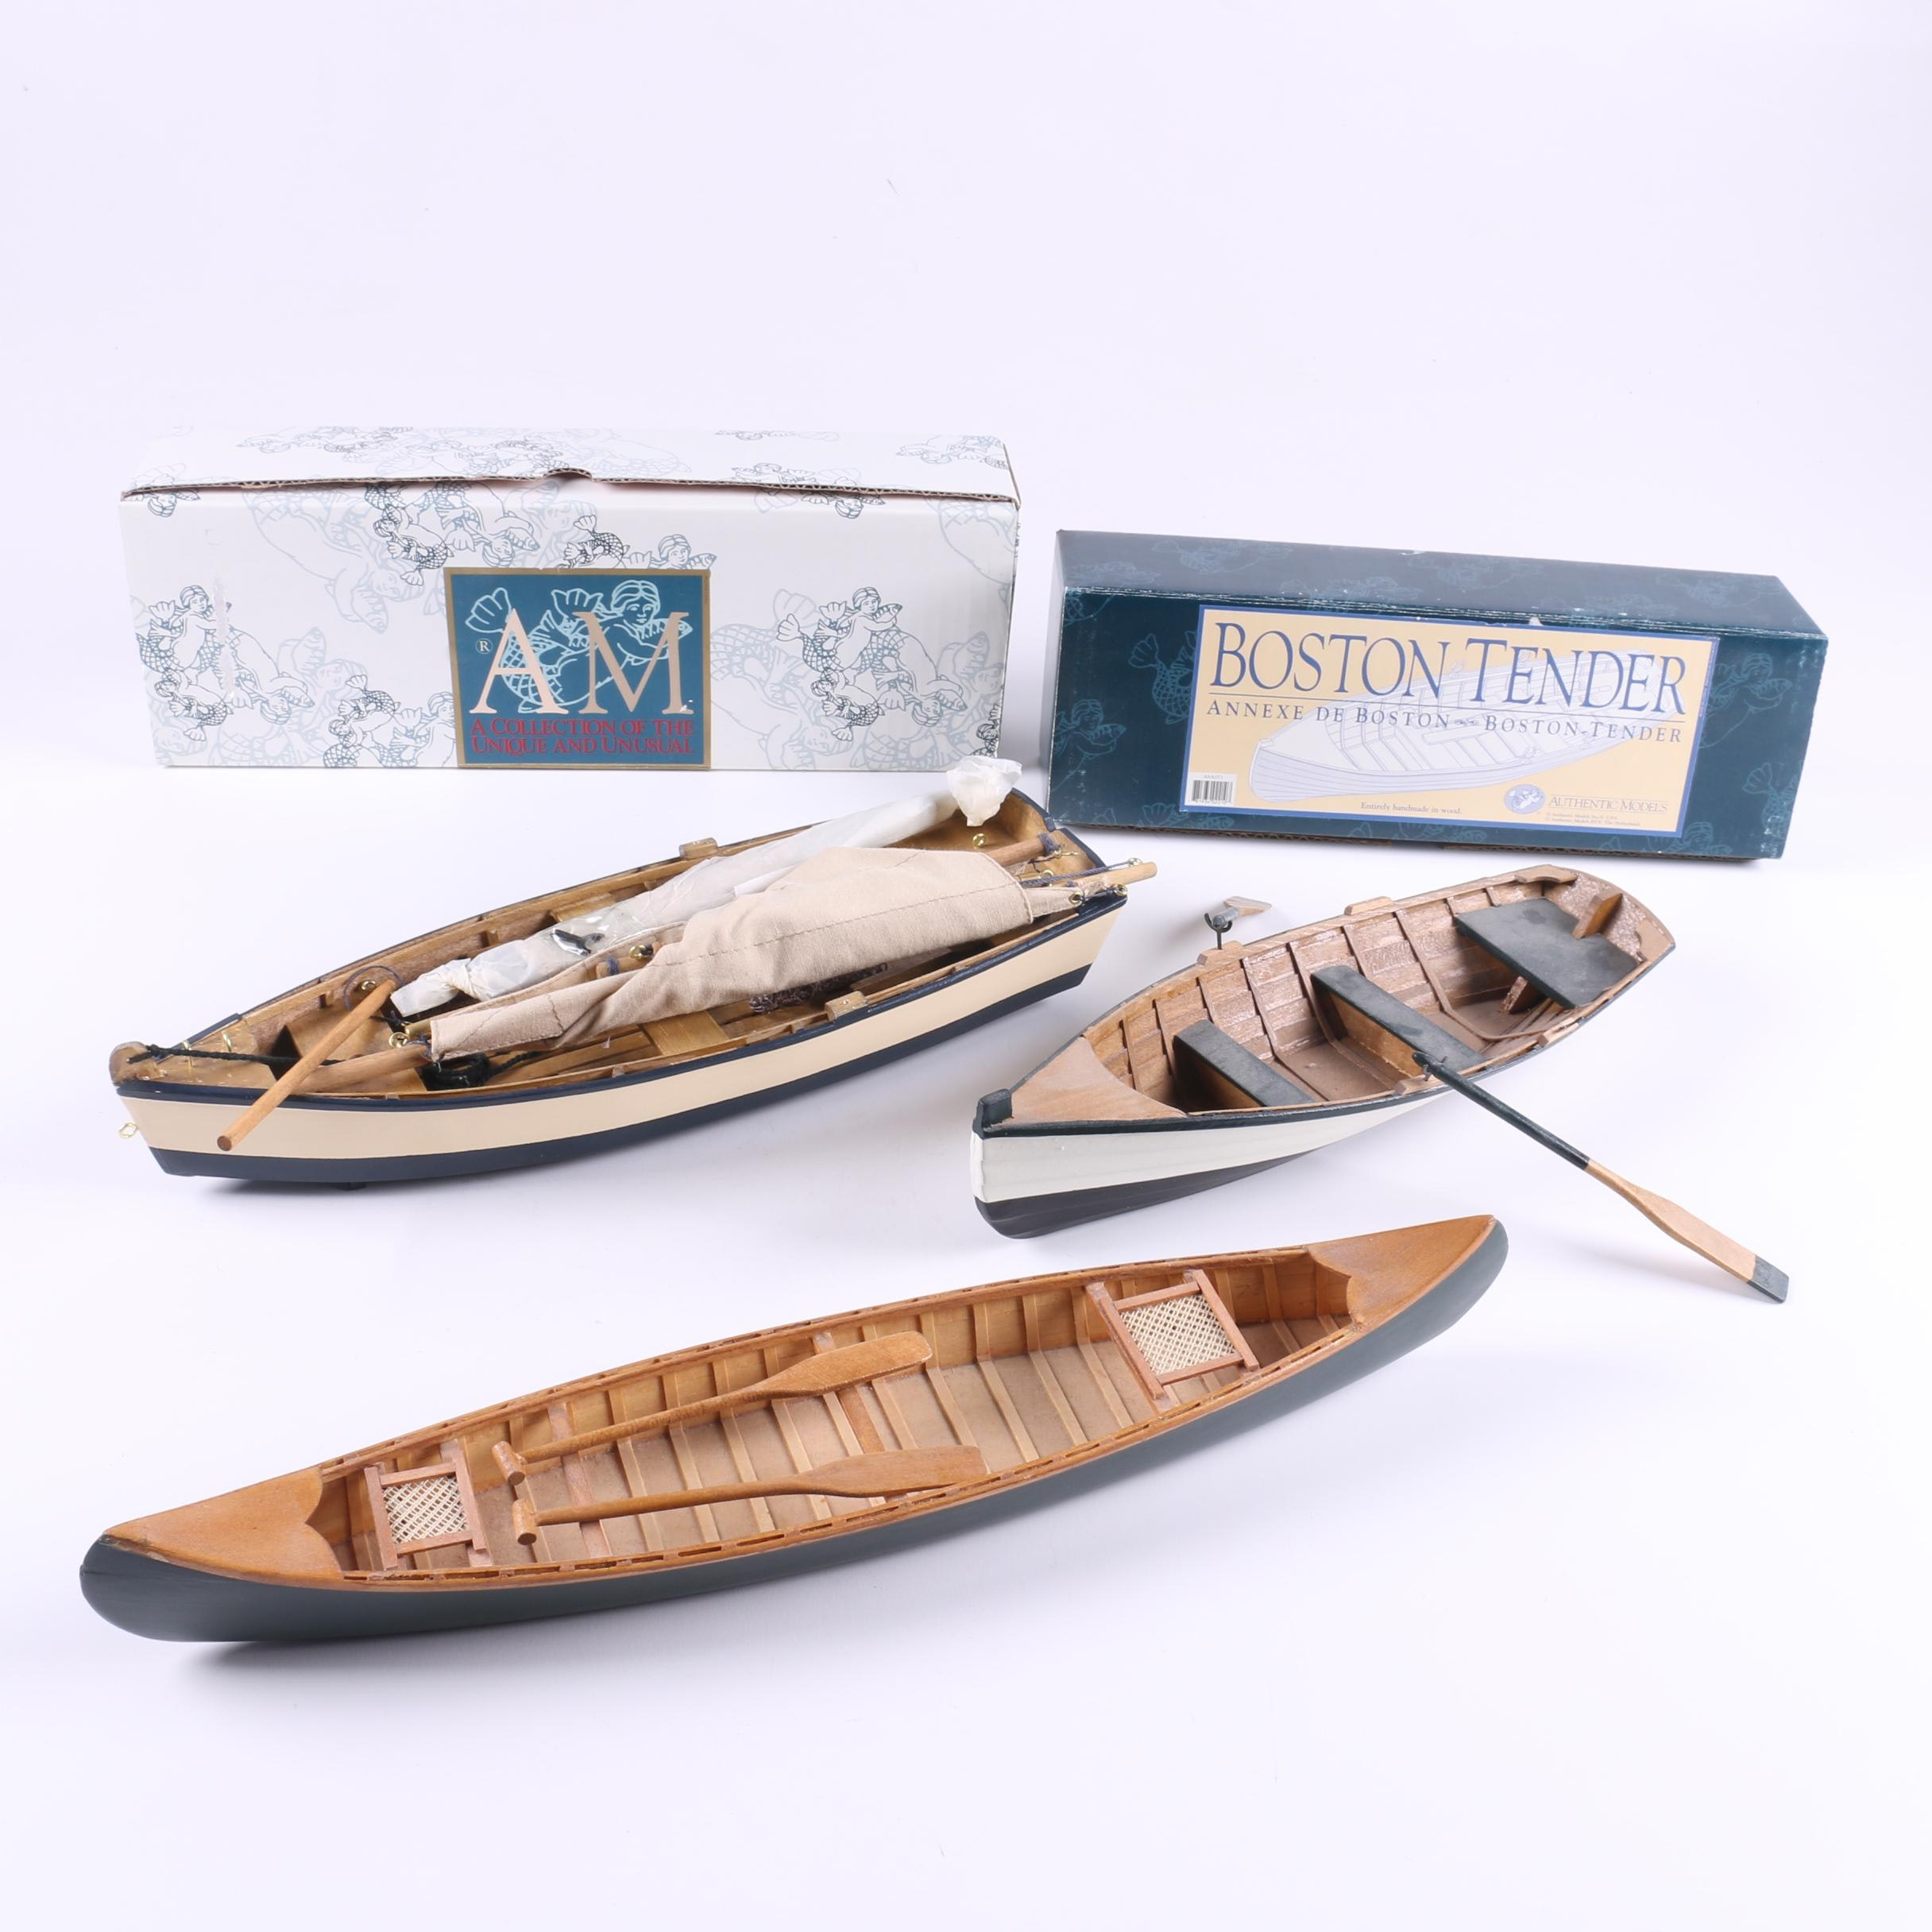 Wooden Model Boats